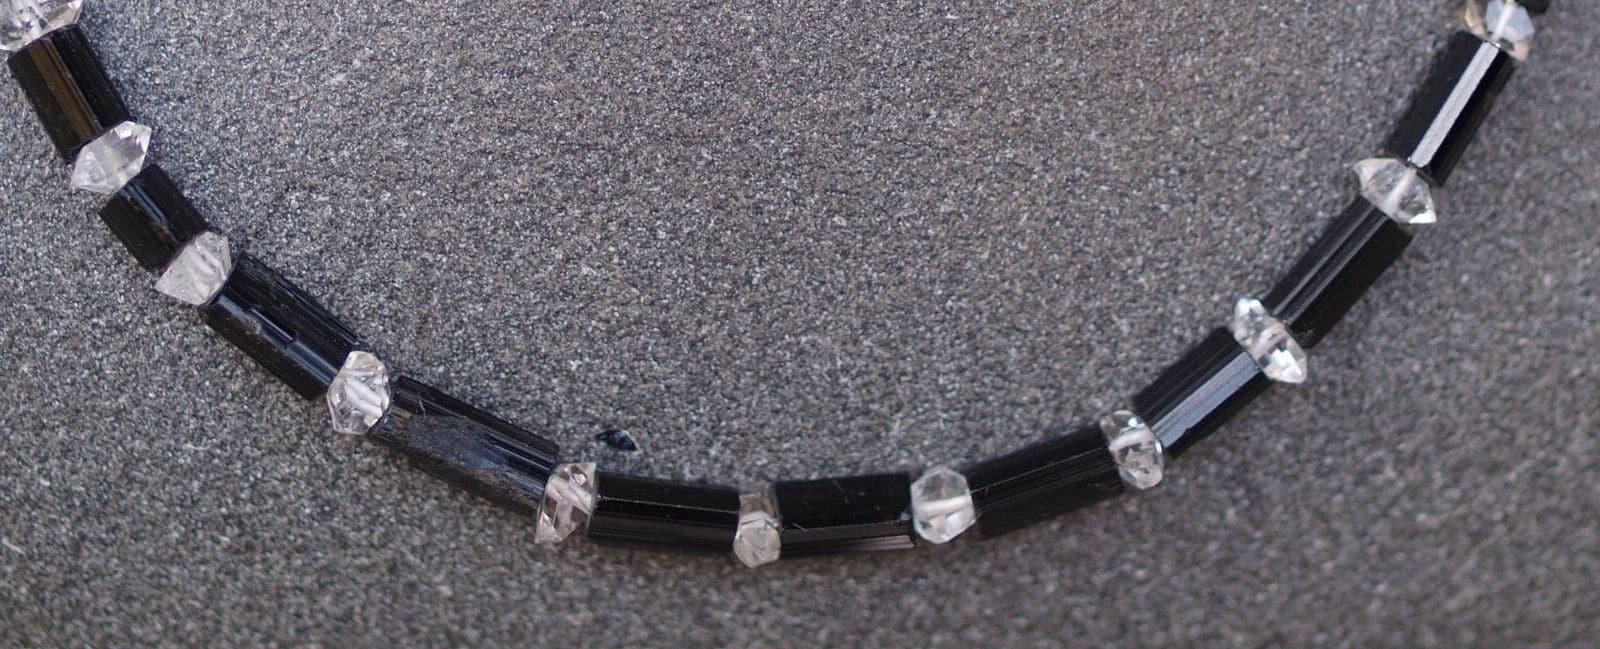 Unikat Kette Silber 925 vergoldet Bergkristall Diamondquarz schwarzer Turmalin